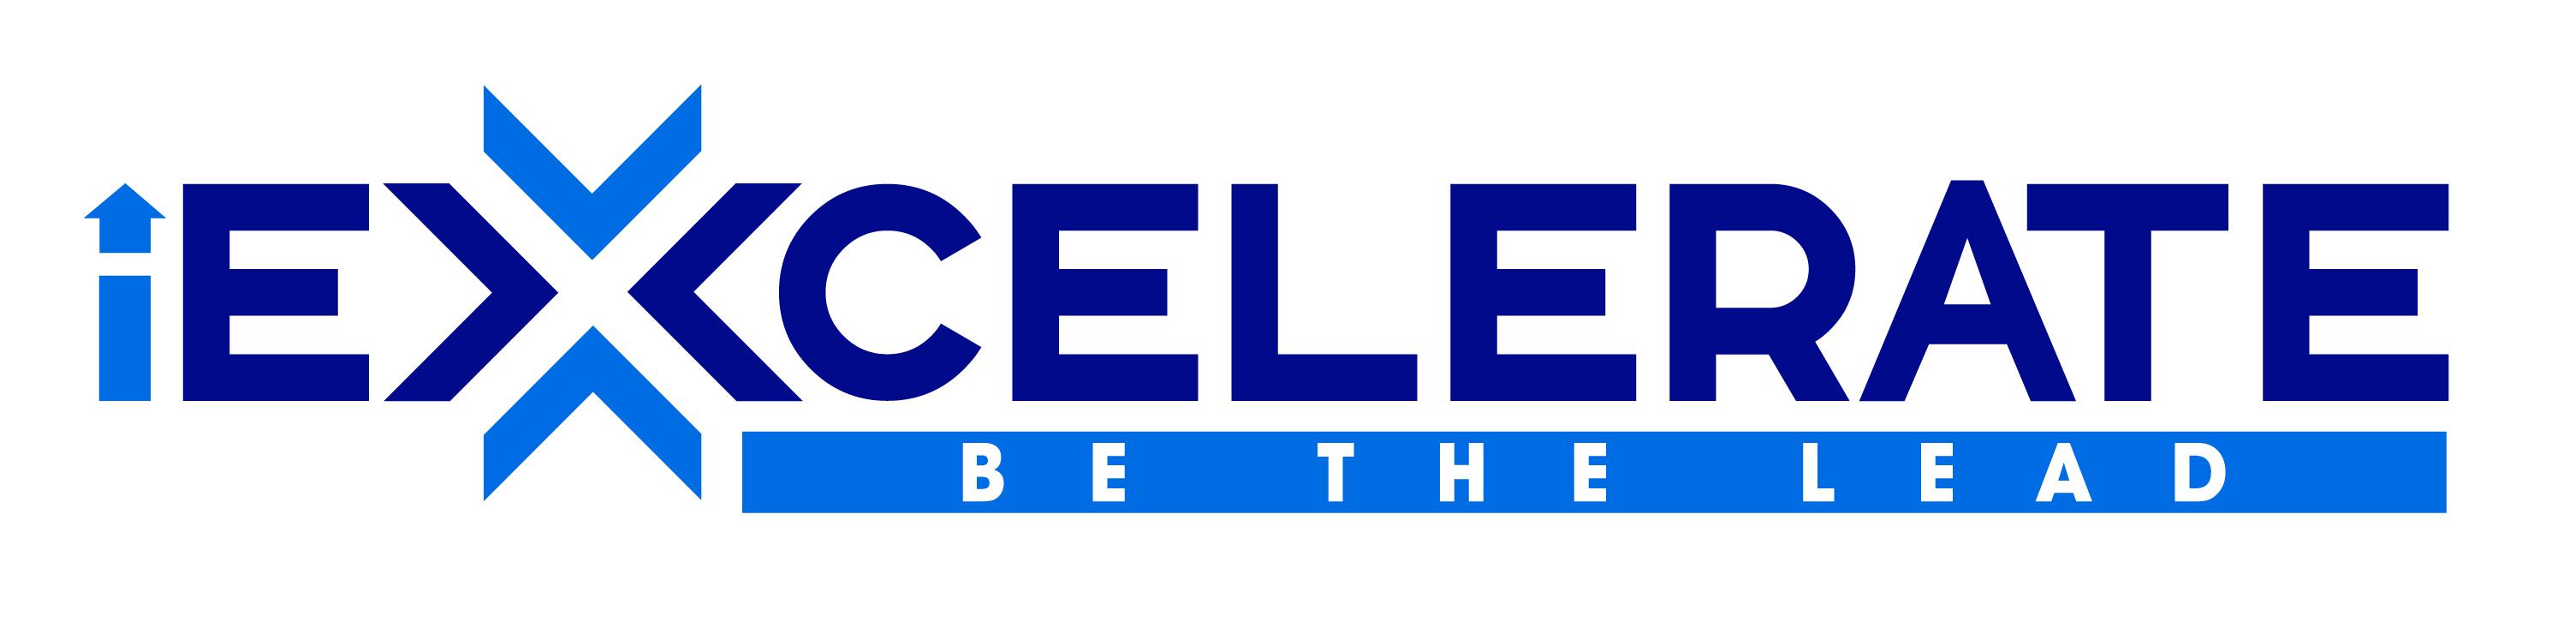 iExcelerate Inc.